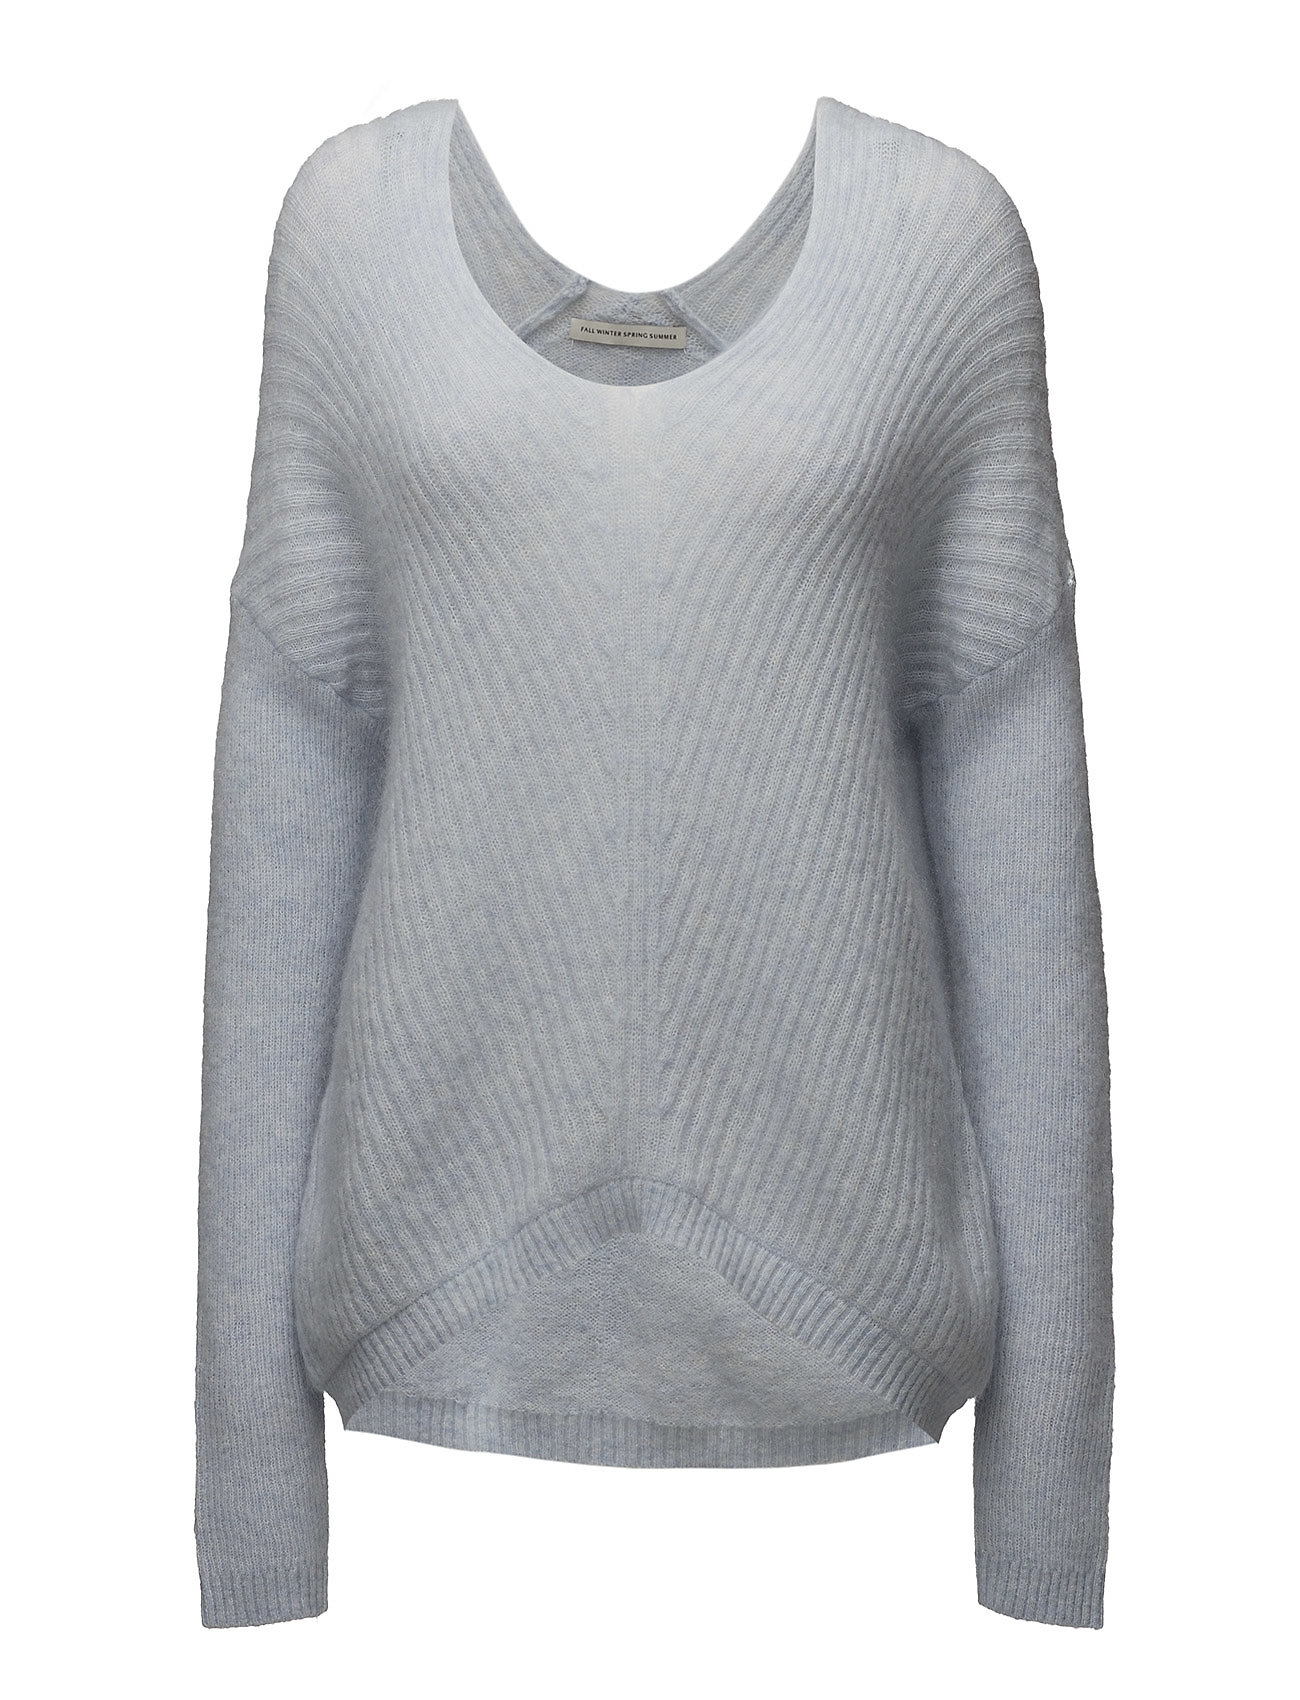 Wenche Fall Winter Spring Summer Sweatshirts til Damer i